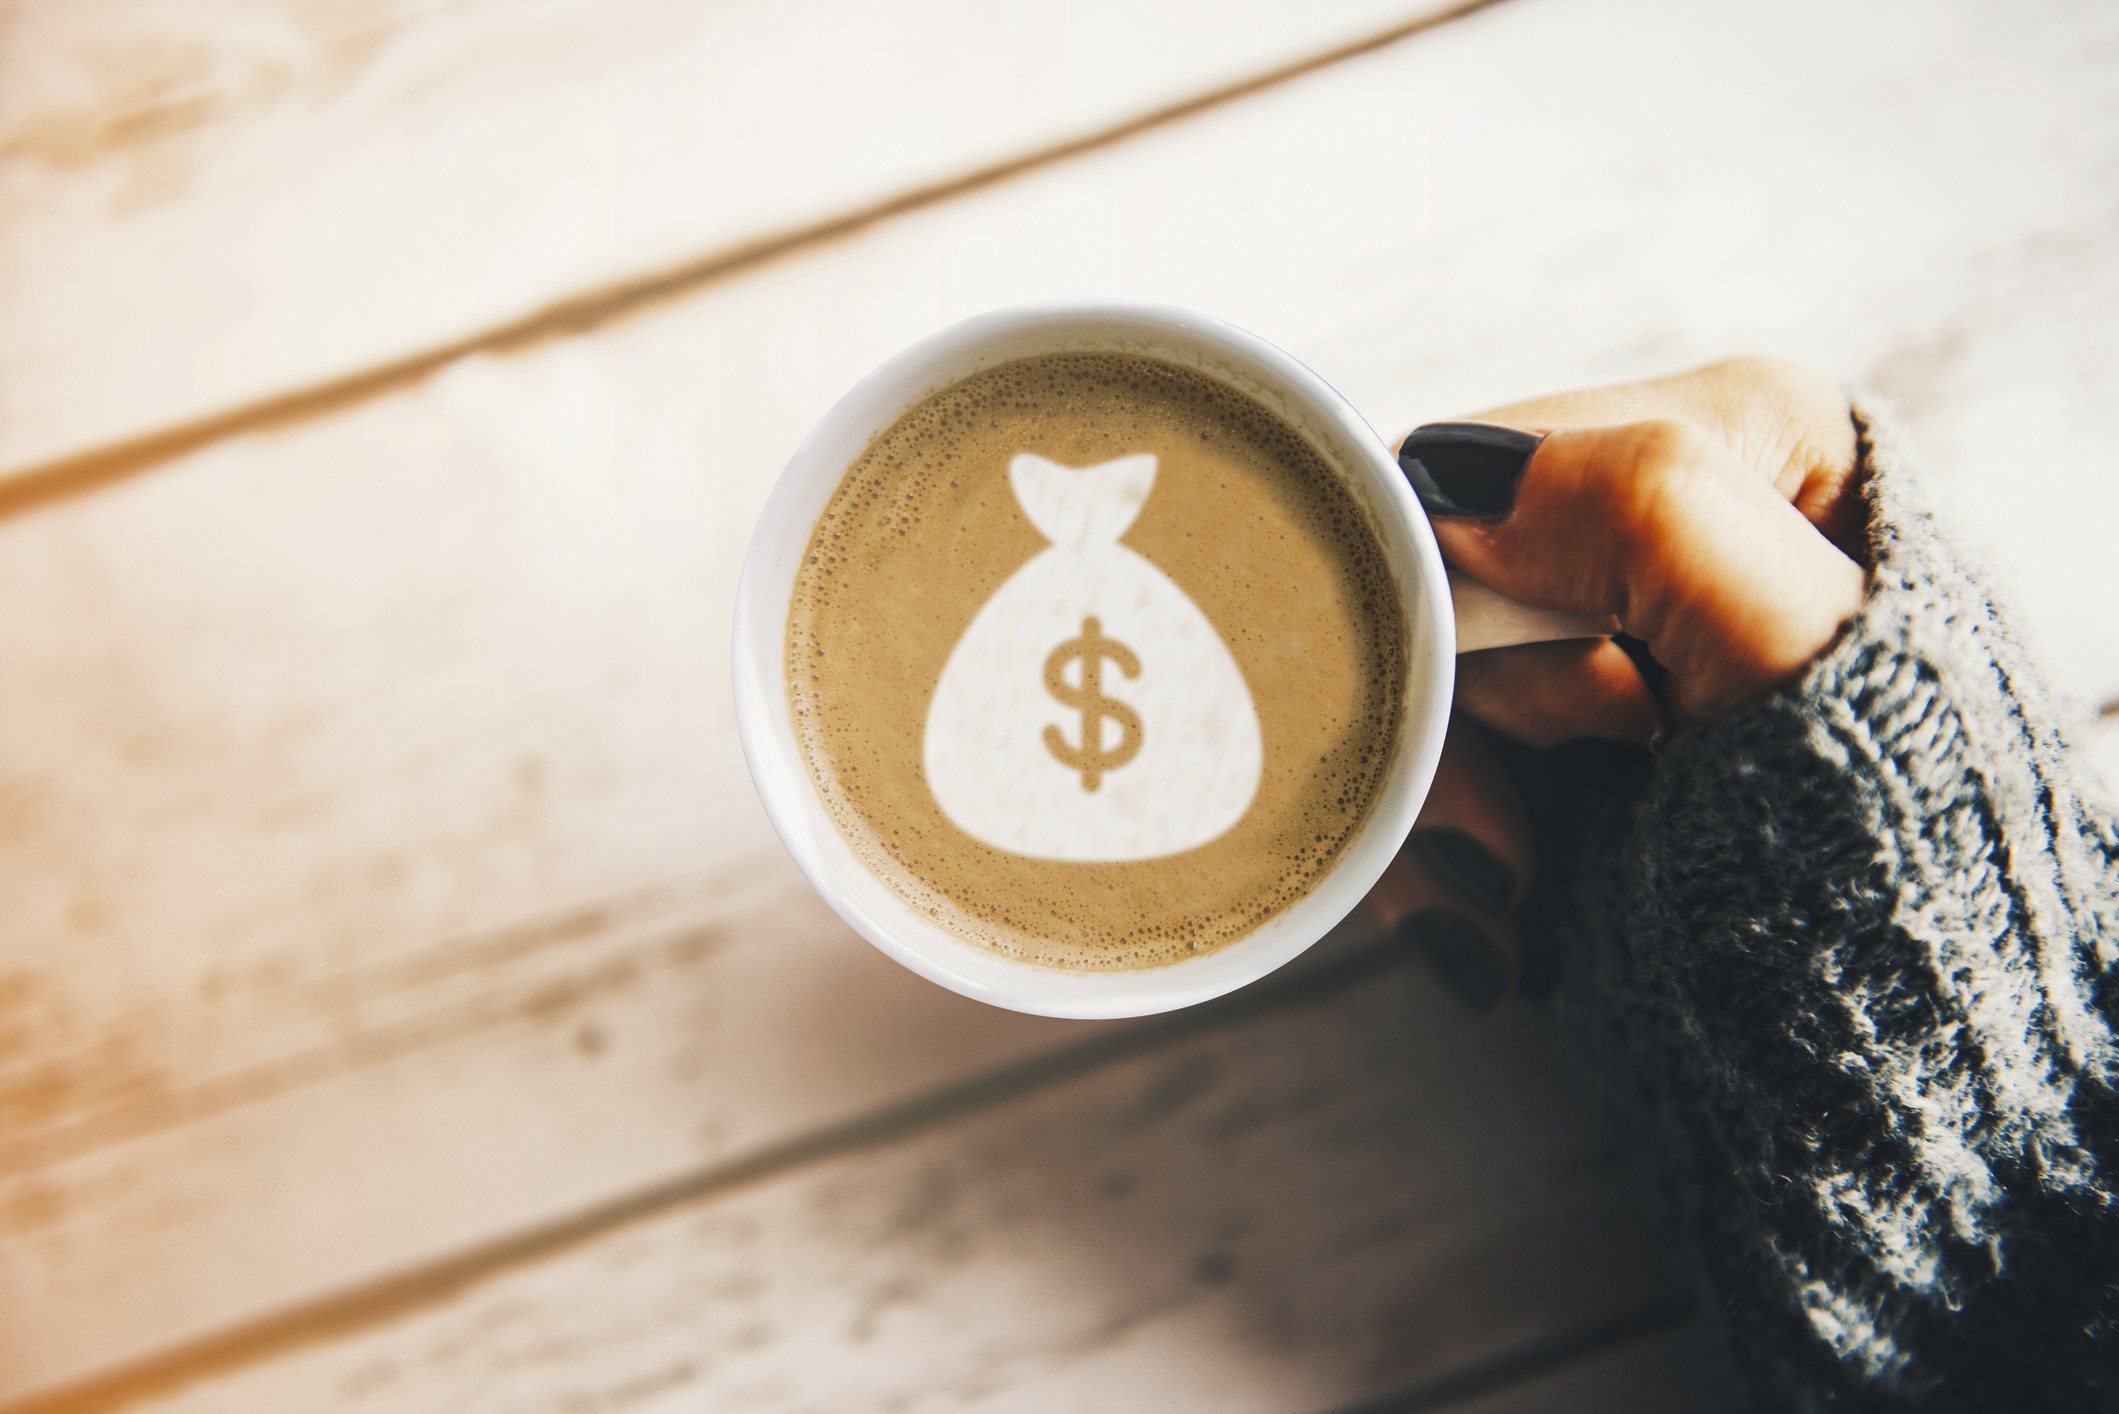 Coffee with foam design of money bag